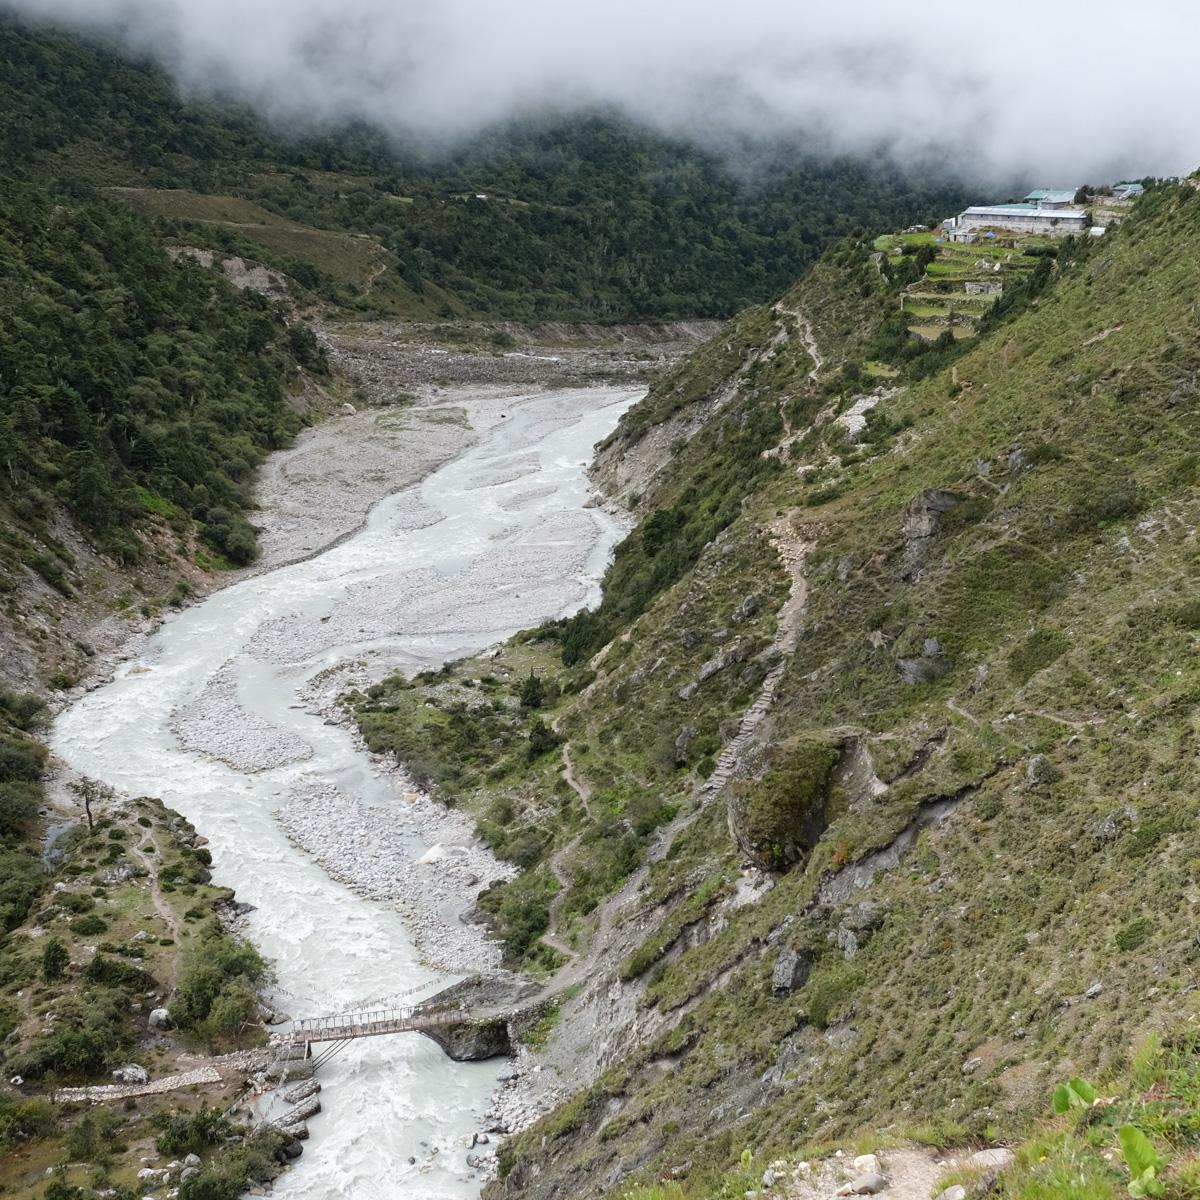 Everest Base Camp, Everest 3 pass #2 14